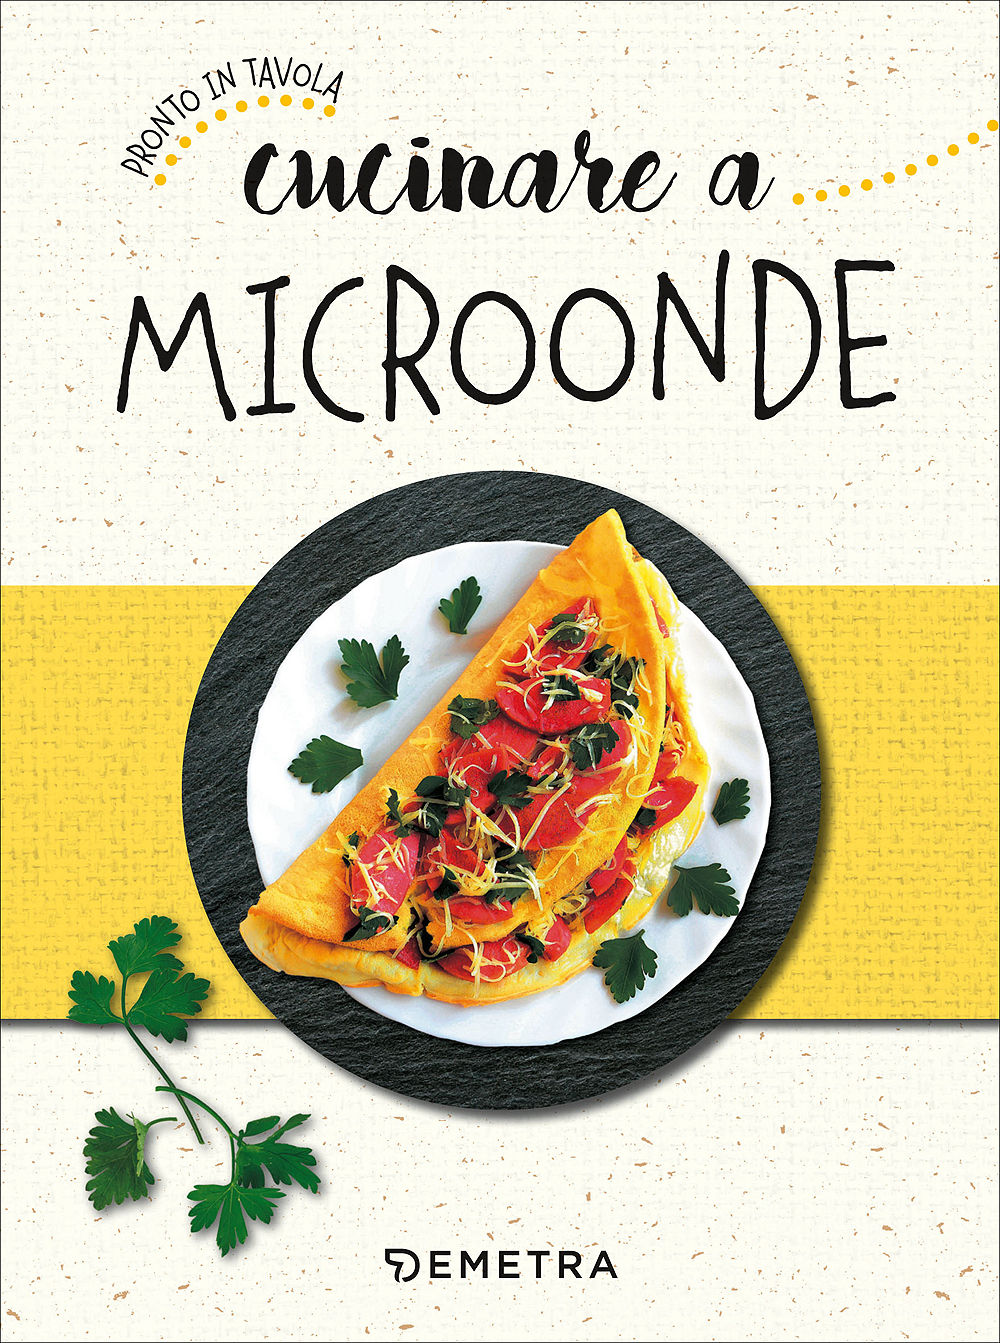 Cucinare a microonde